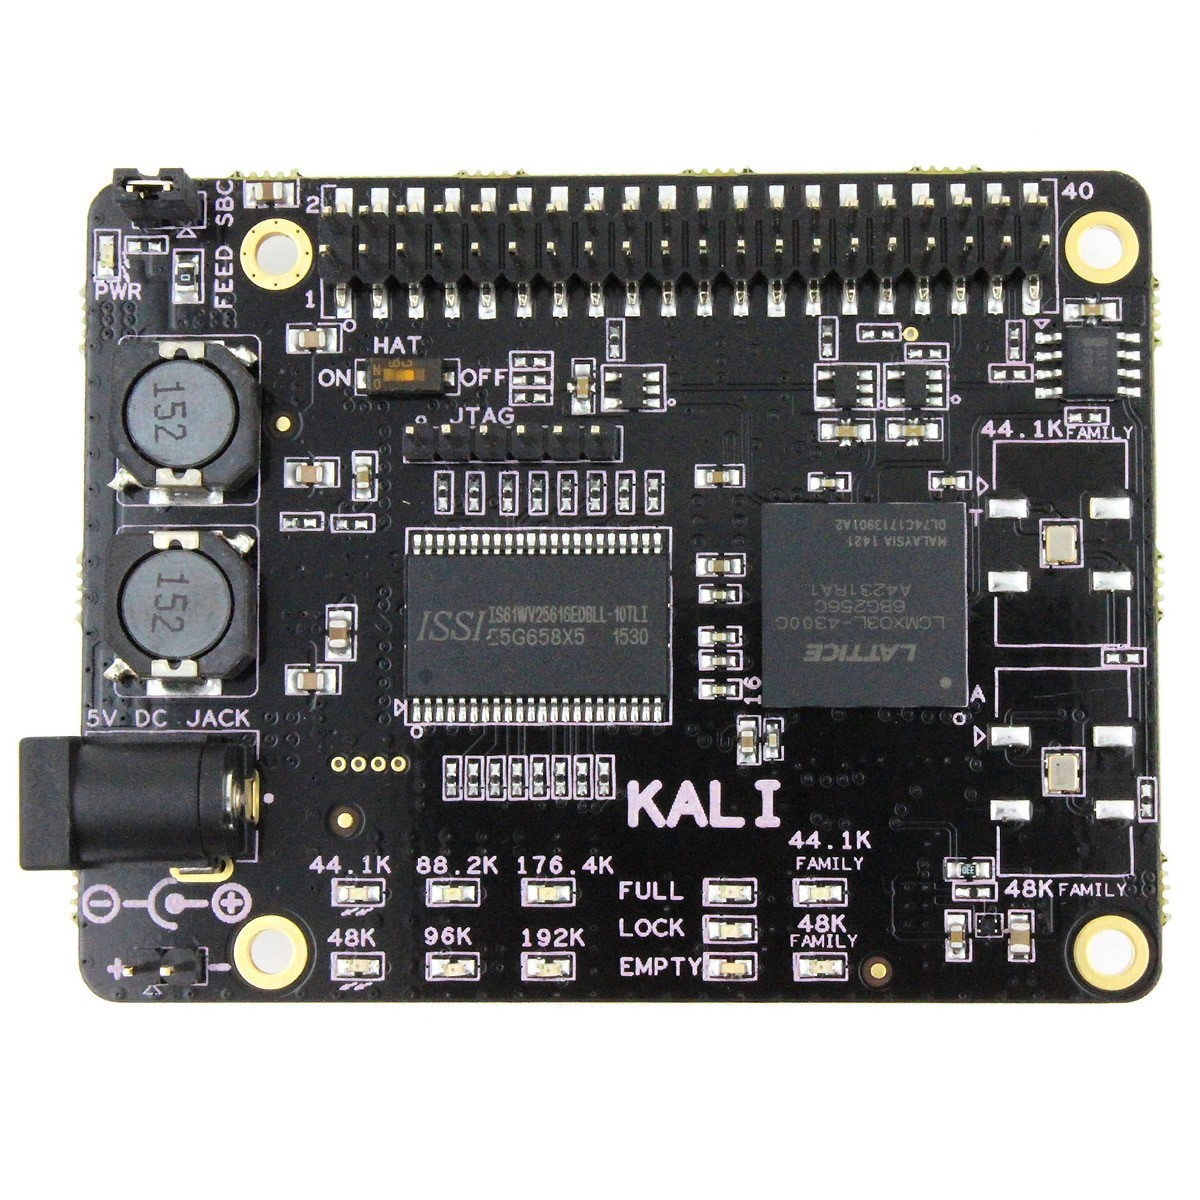 ALLO KALI Reclocker I2S FIFO Sparky SBC and Raspberry 44/48MHz 32bit 384kHZ